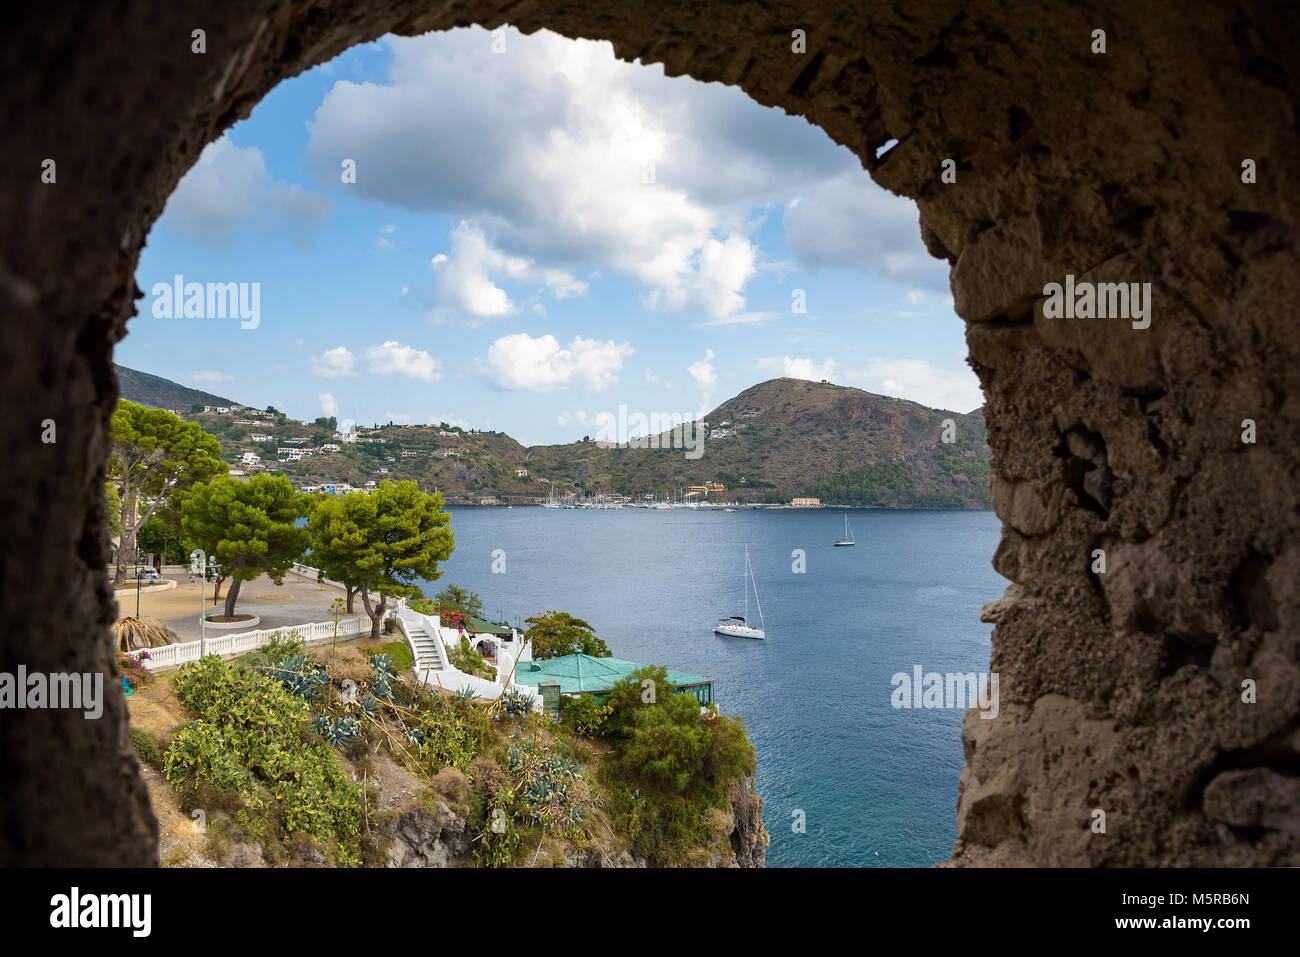 Lipari Island coast seen through the stone window, Aeolian Islands, Italy Stock Photo